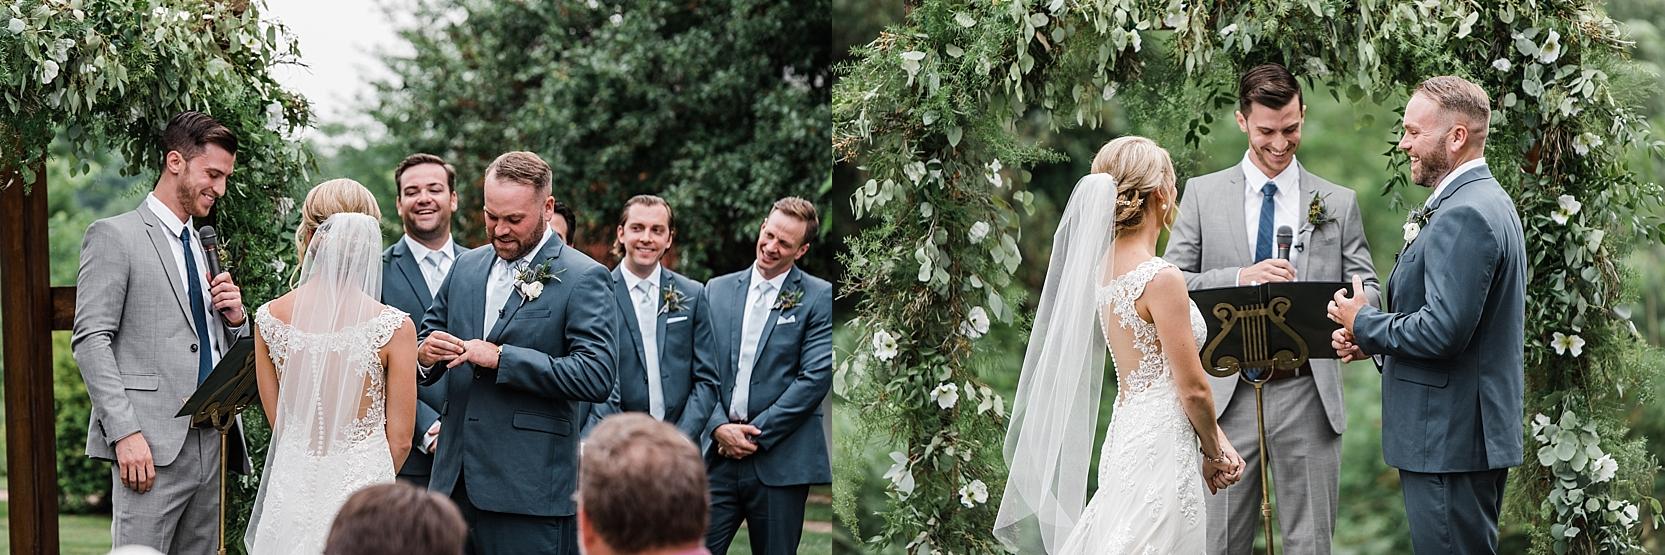 Summer Wedding at the Welshfield Inn | Burton, Ohio | Cleveland, Youngstown, Pittsburgh Wedding Photographer | Lindsey Ramdin